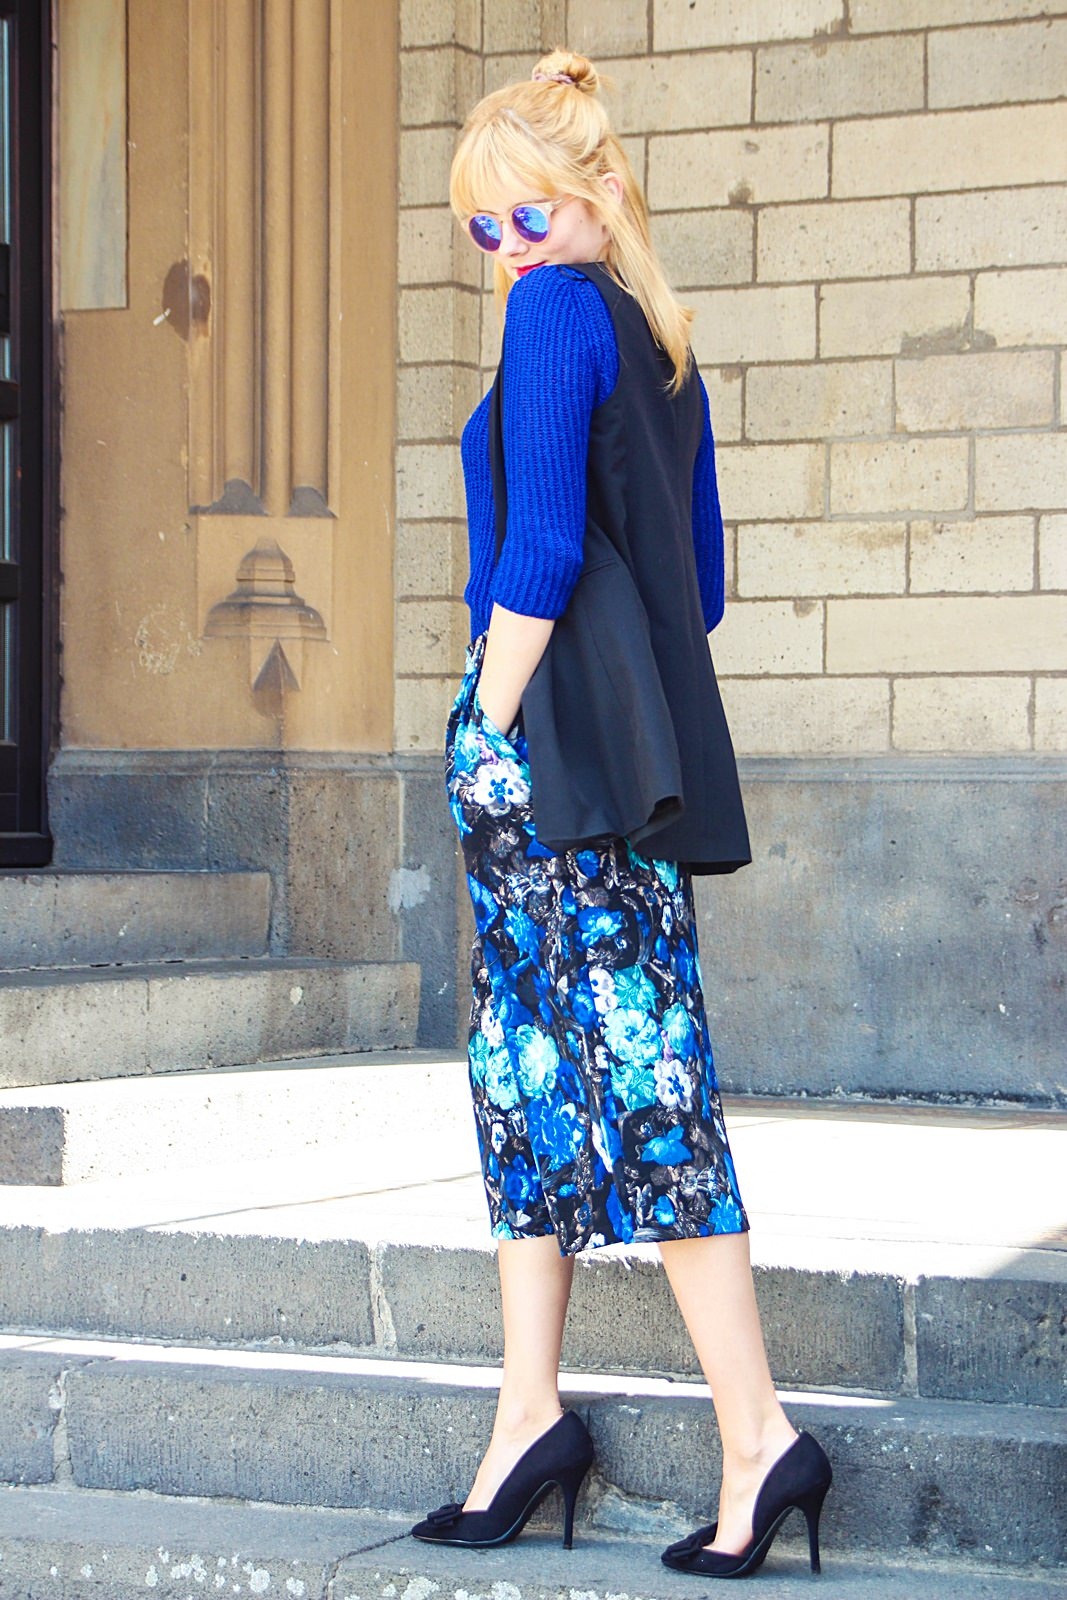 Des Belles Choses_Culotte_Floral Spring Trend 6